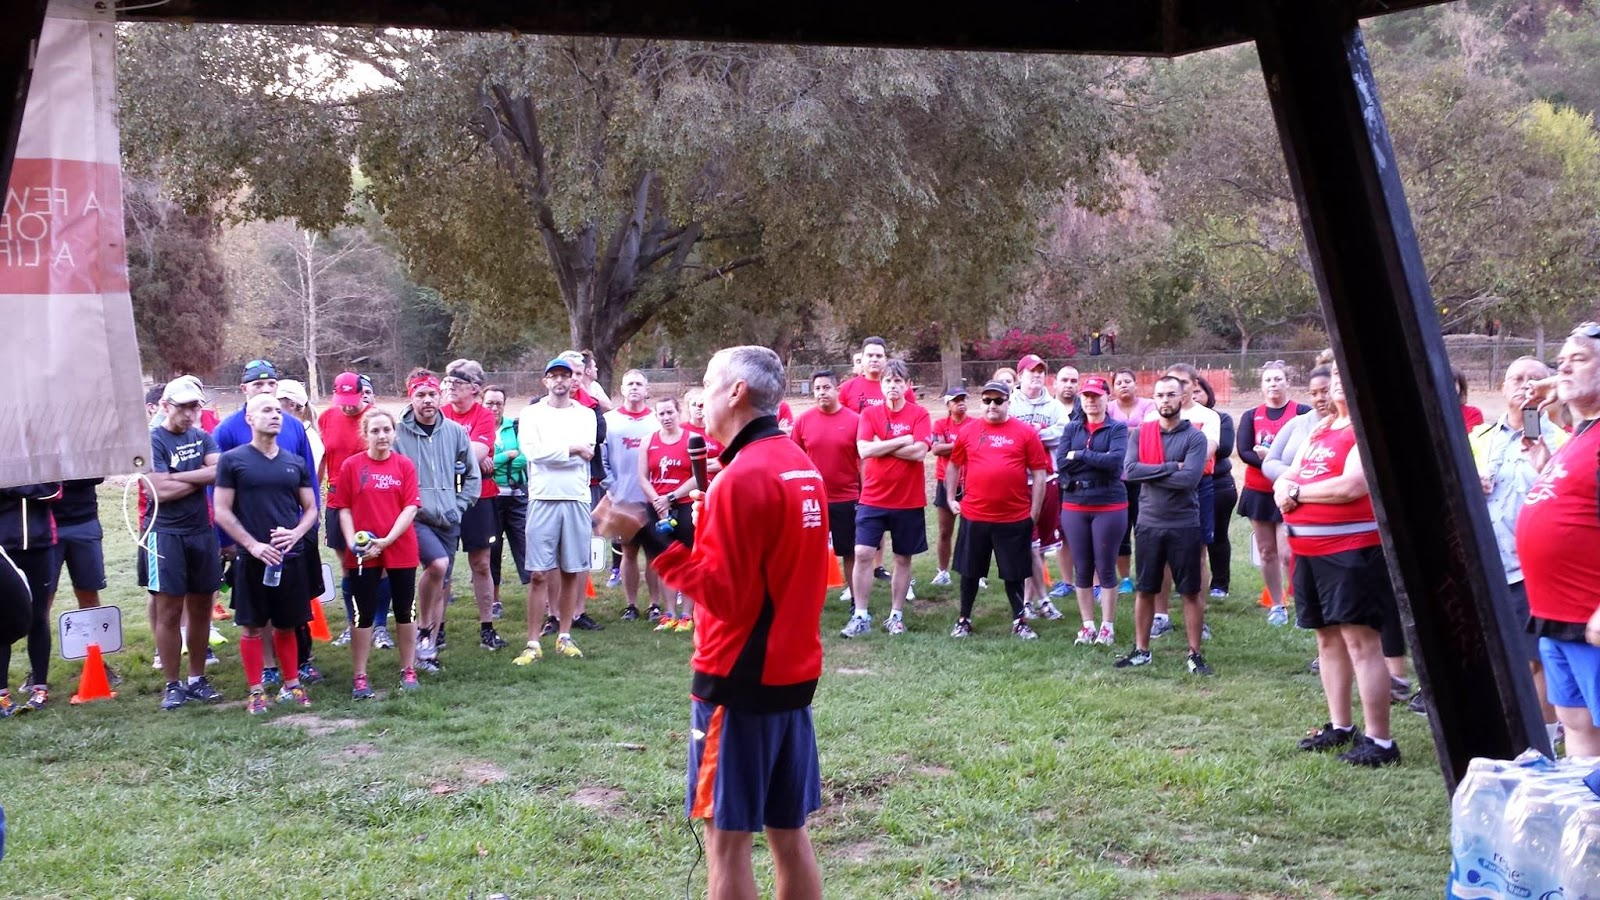 2015 LA Marathon CEO addressing the troops